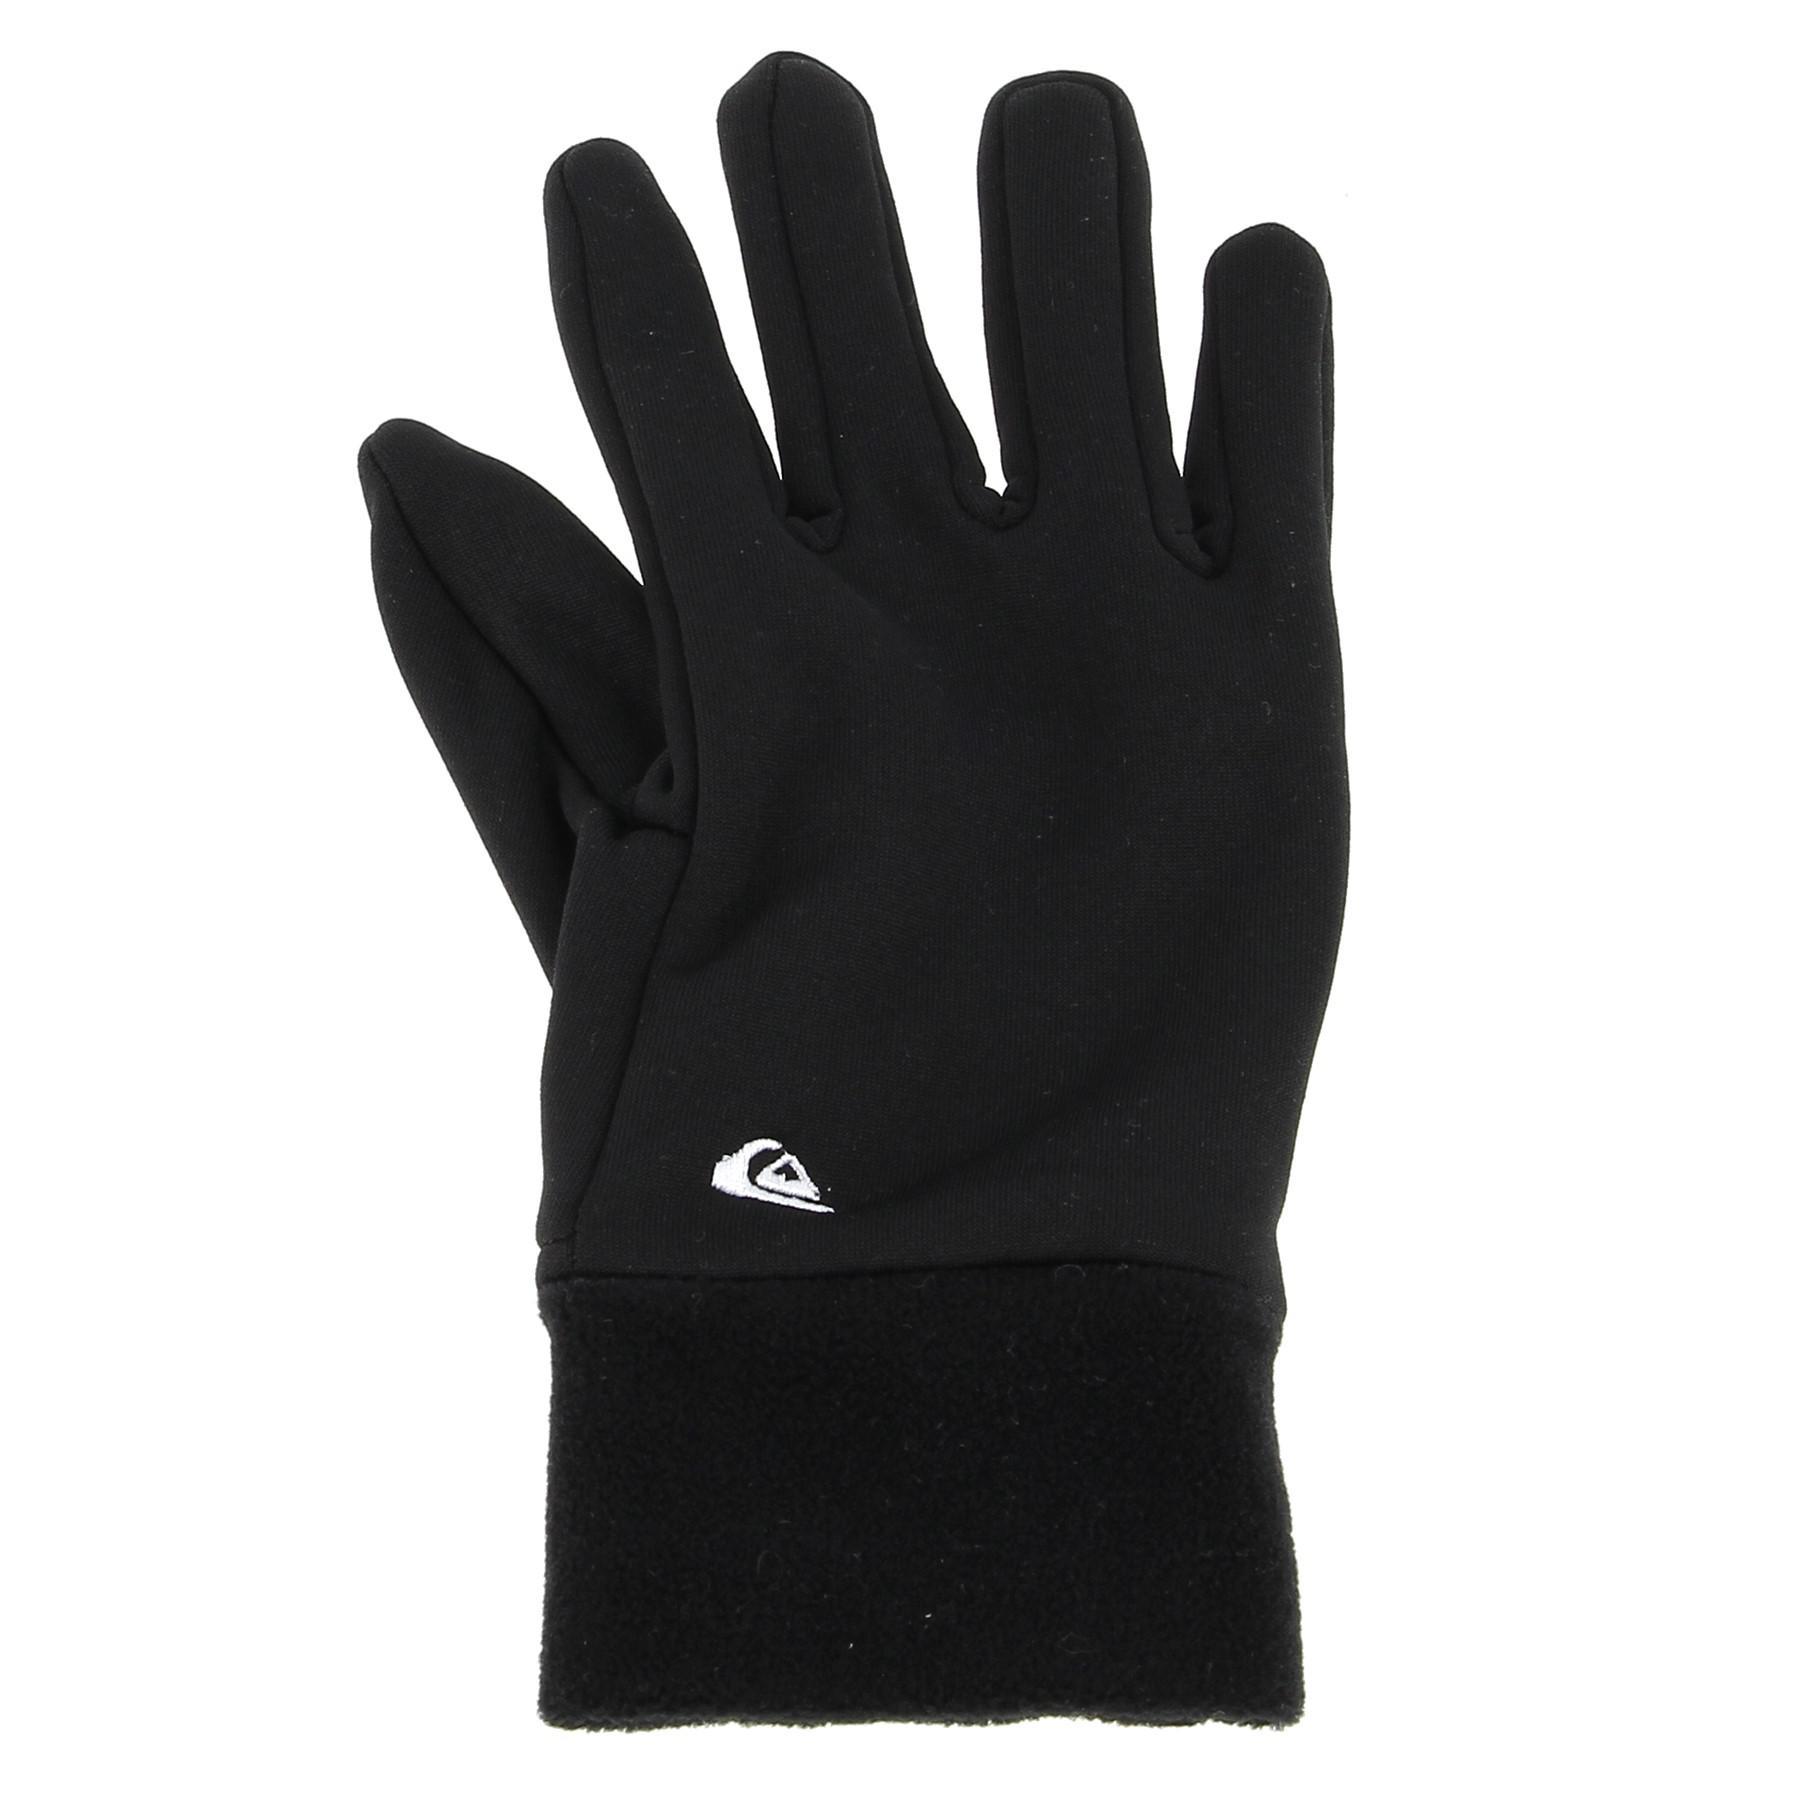 Gloves-Quiksilver-Hottawa-Black-Gloves-Black-59692-New